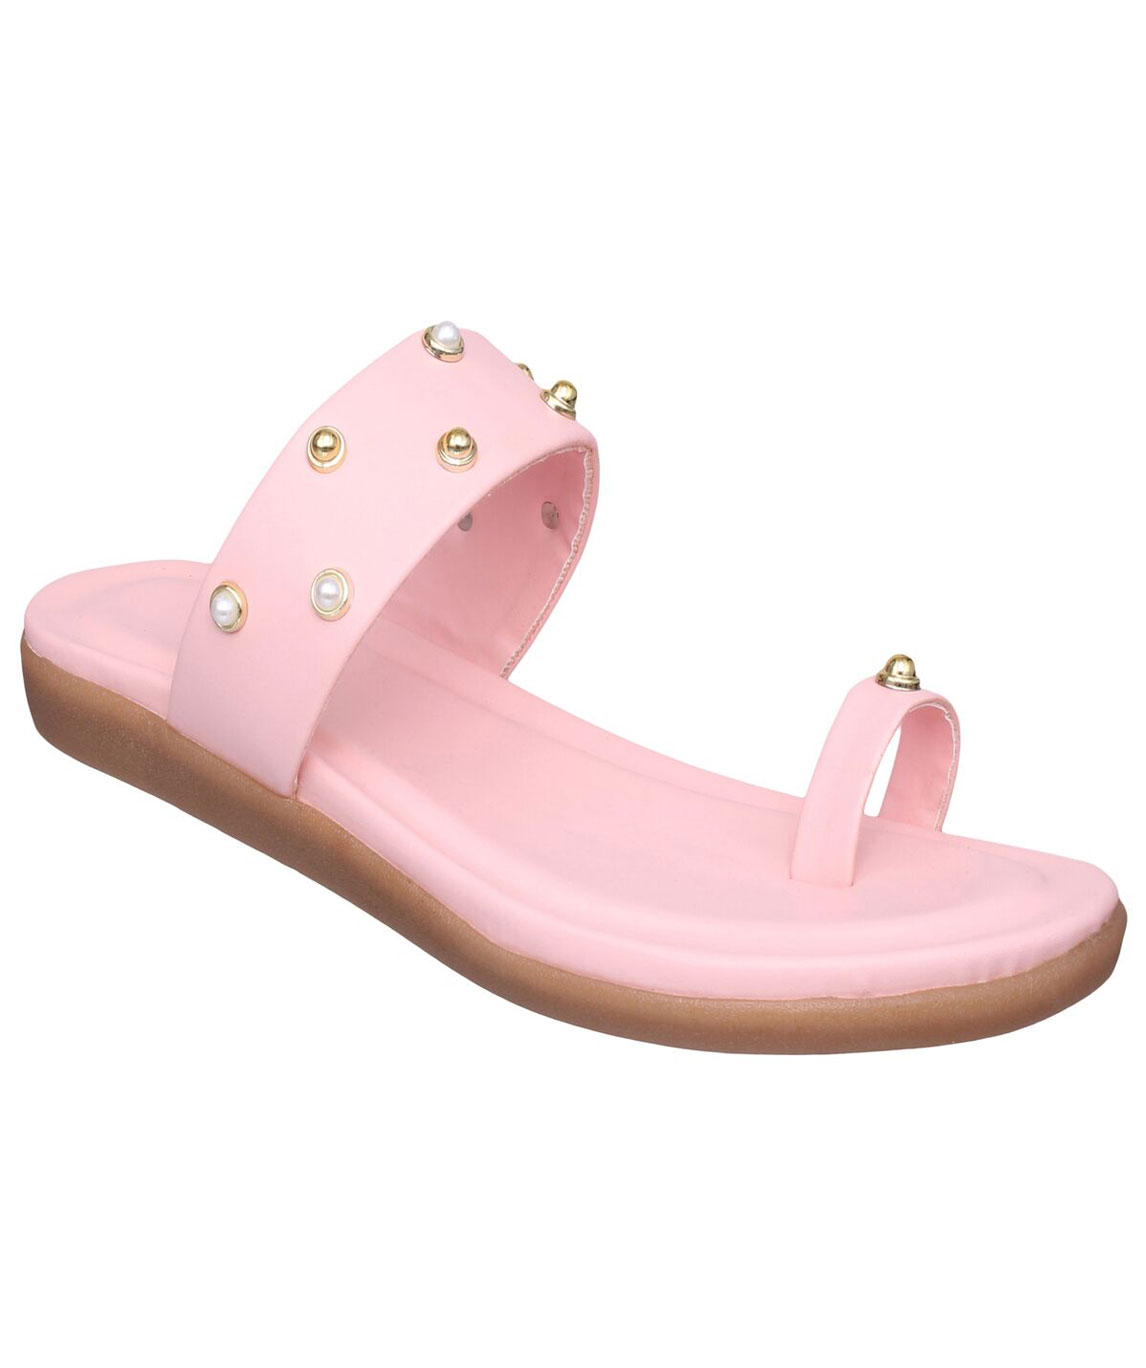 Sindhi Footwear Women`s Pink Rexin Casual Flats